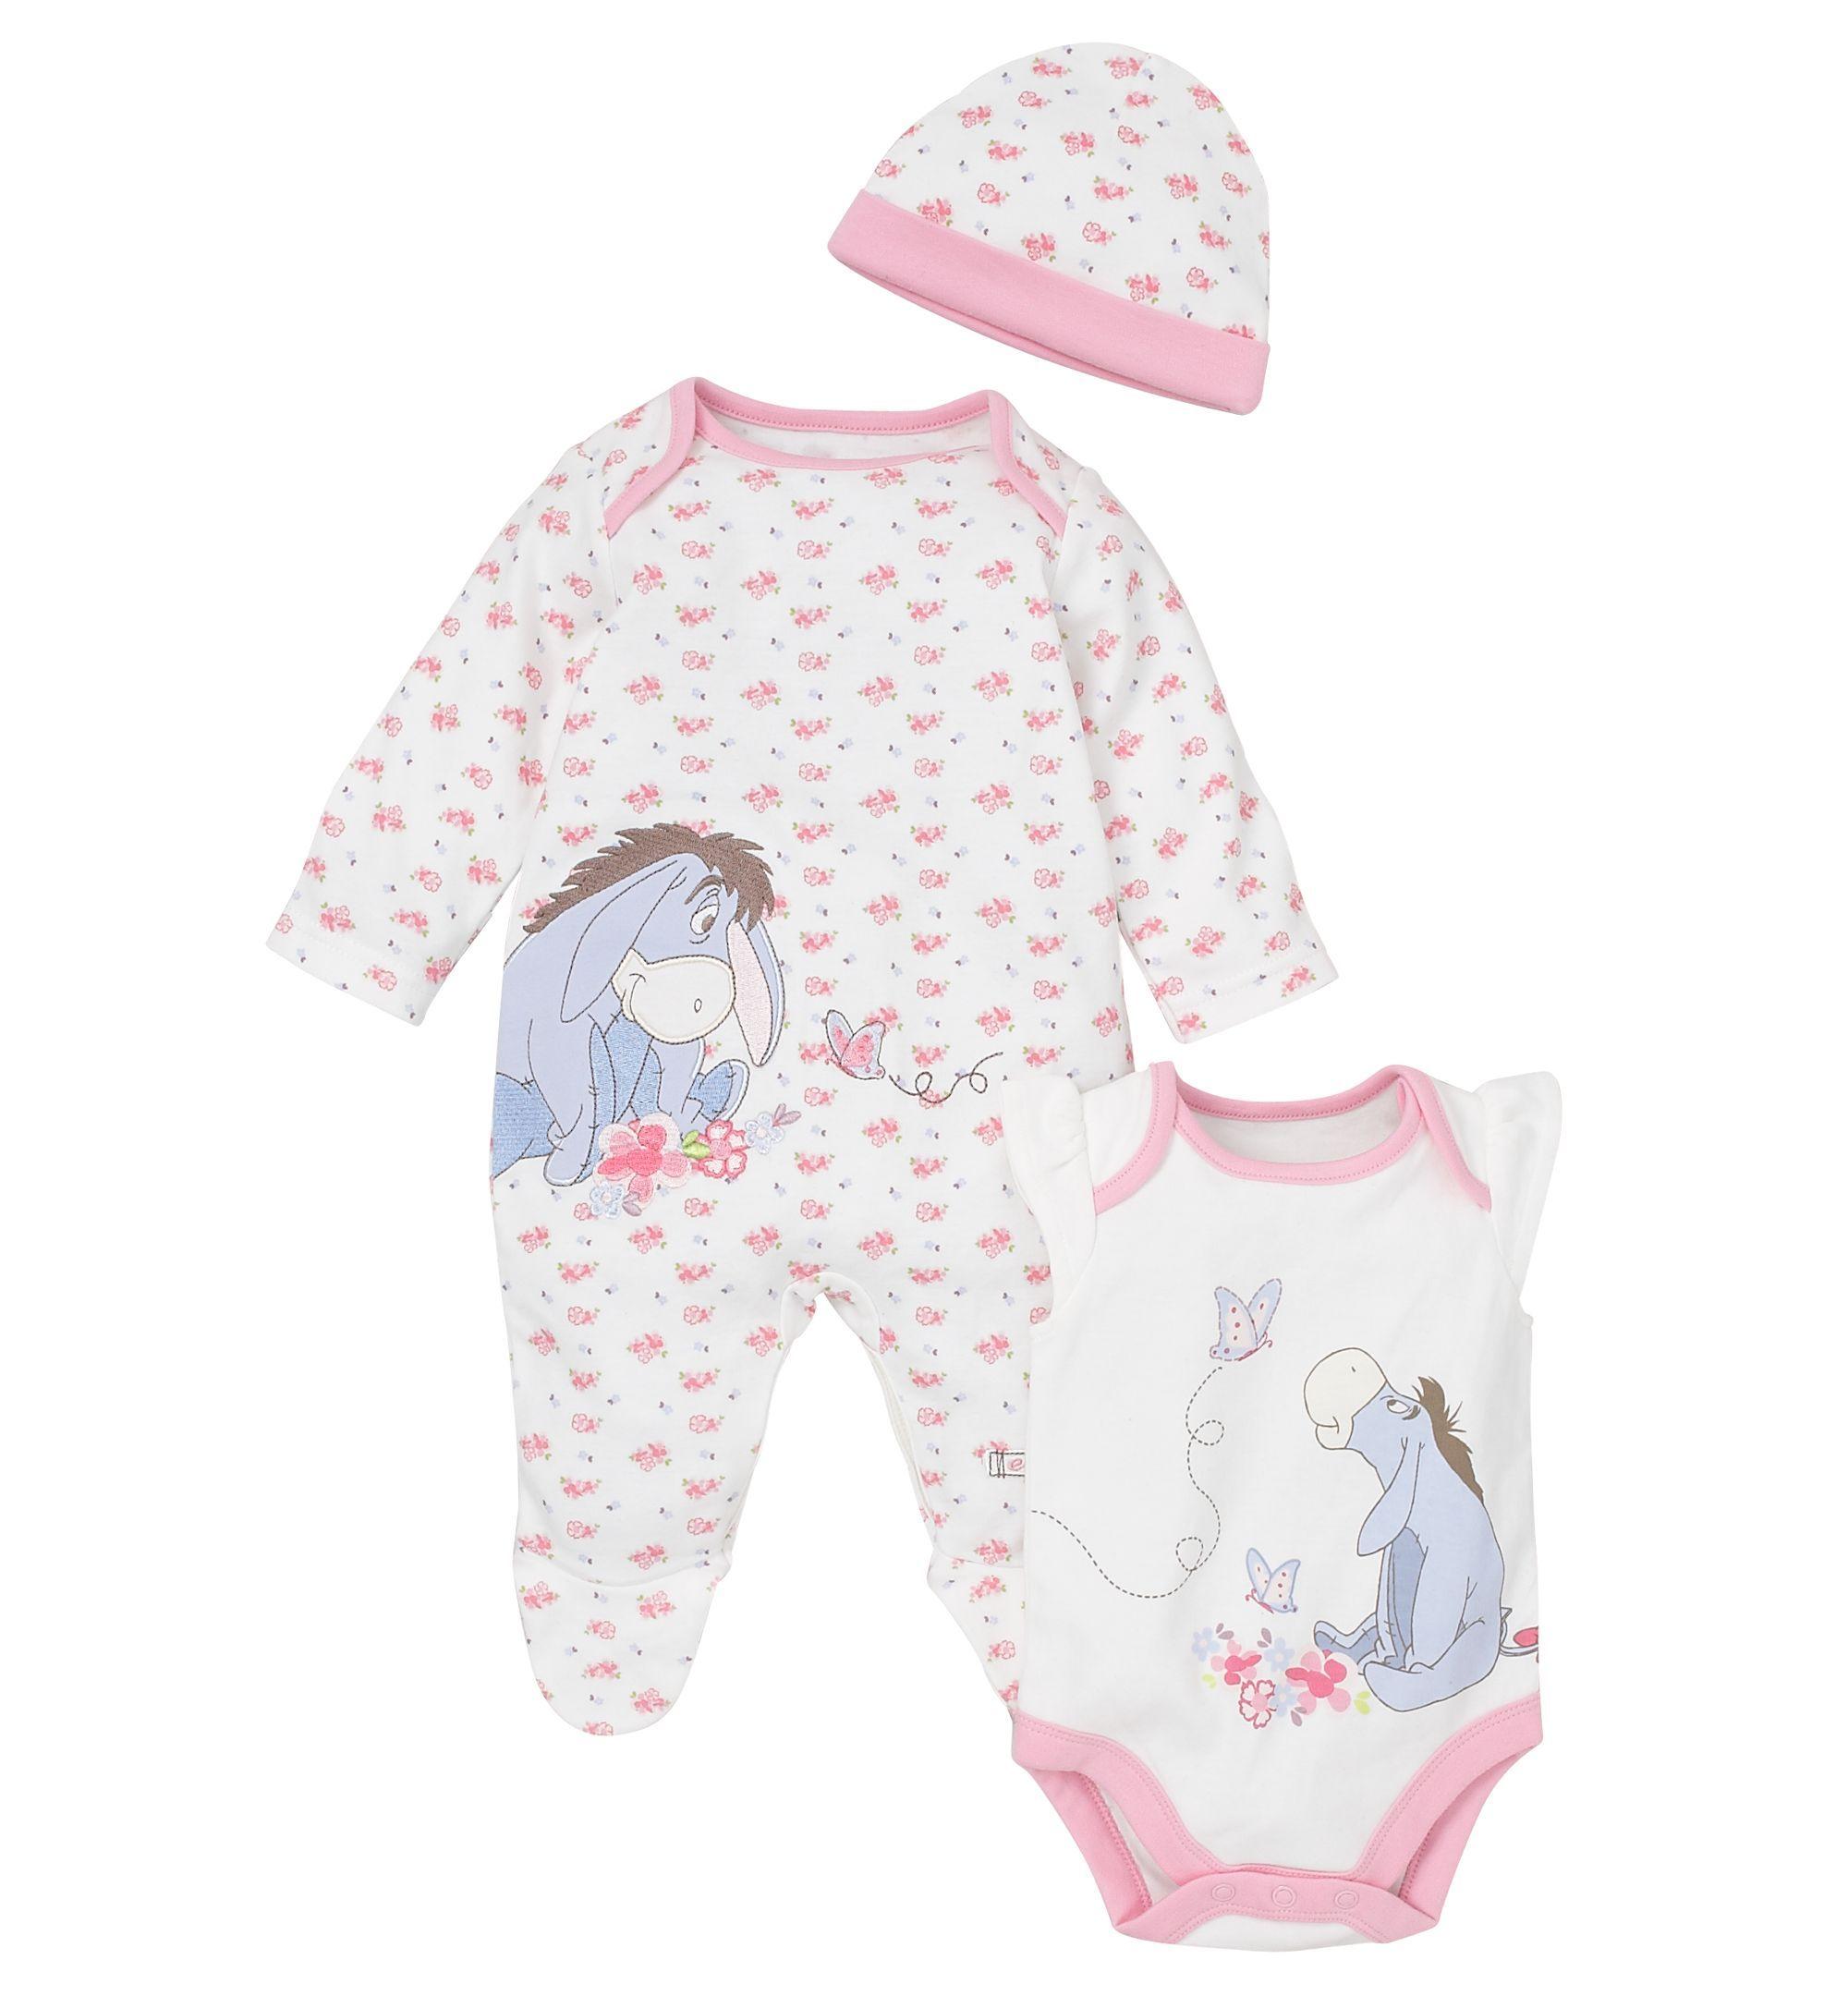 cd974afba5597 Eeyore Set - 3 Piece Set Disney Baby Clothes Girl, Baby Disney, Disney Baby